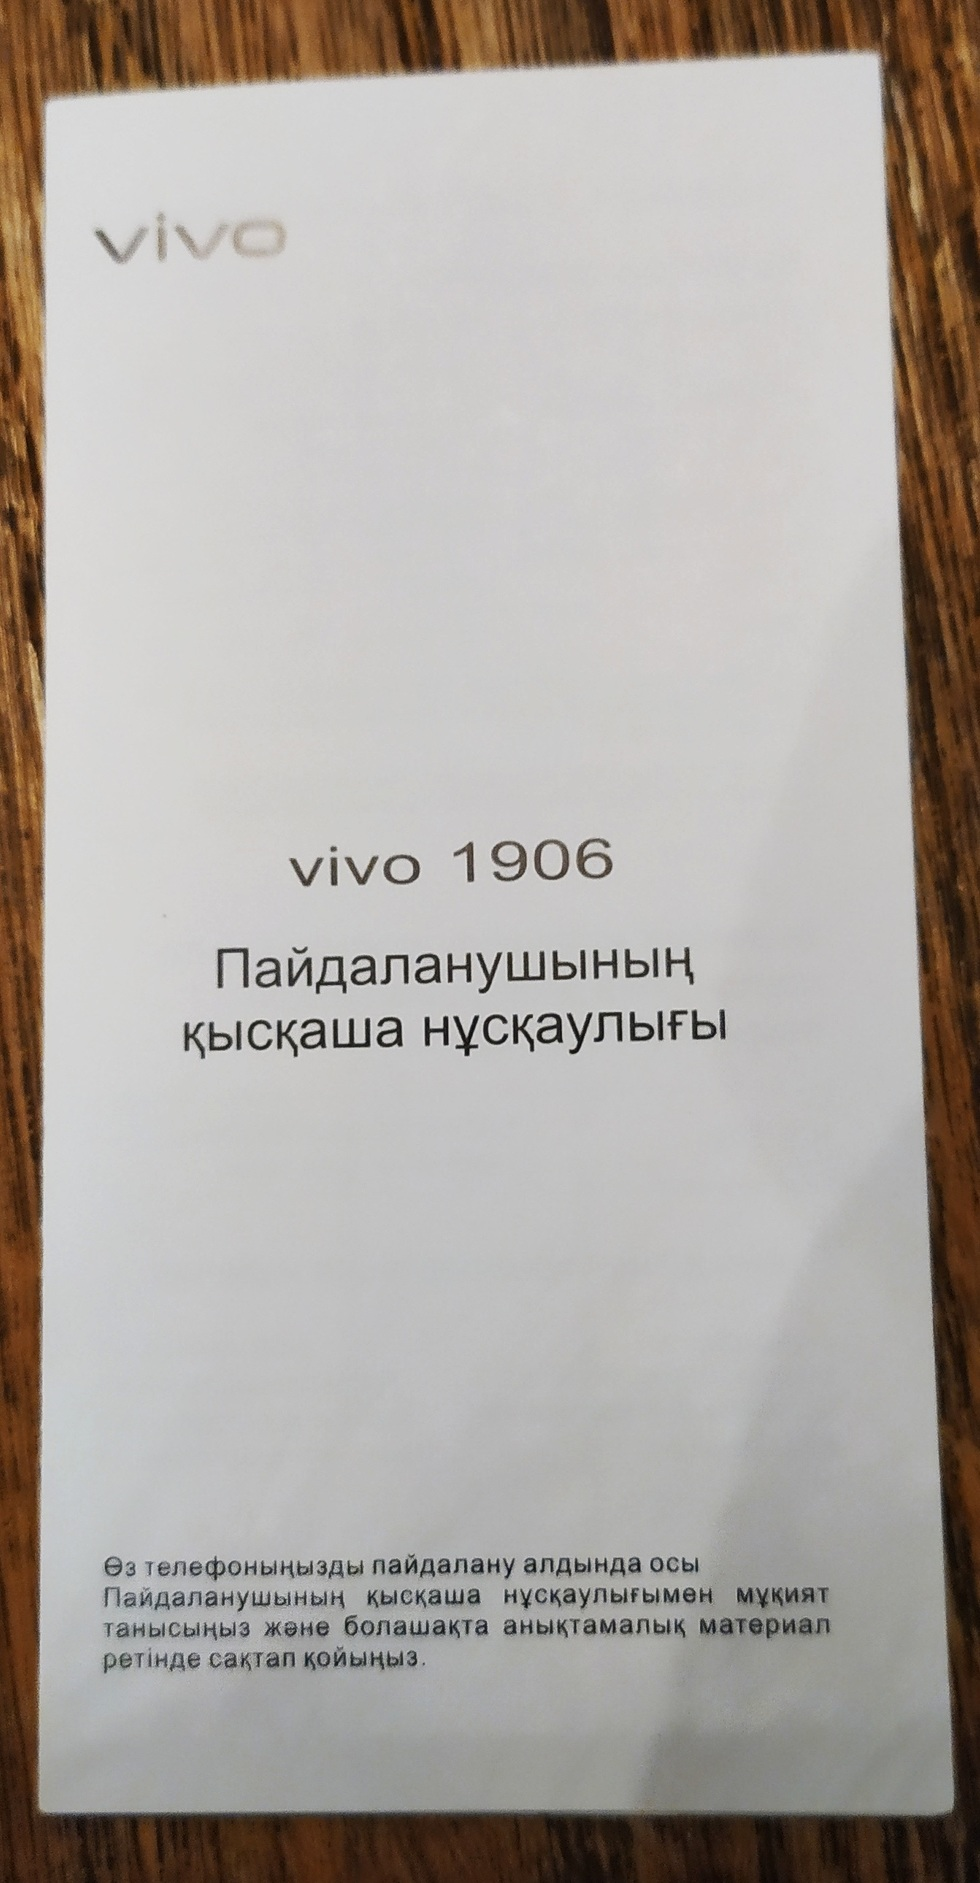 IMG_20191122_201546.jpg